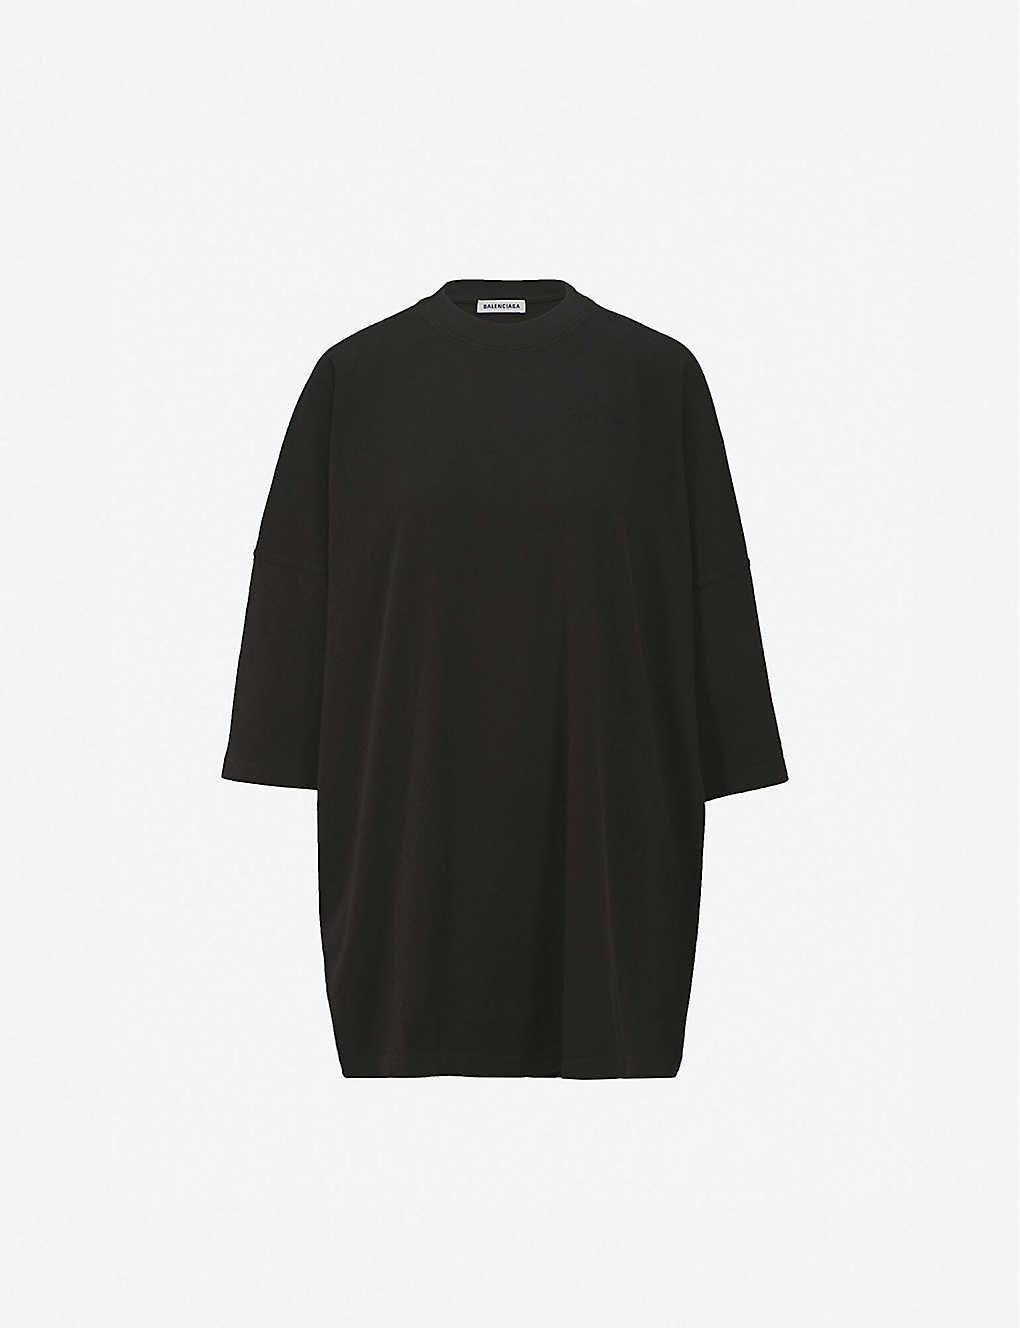 c92f4dfc980a BALENCIAGA - Ego oversized cotton-jersey T-shirt | Selfridges.com